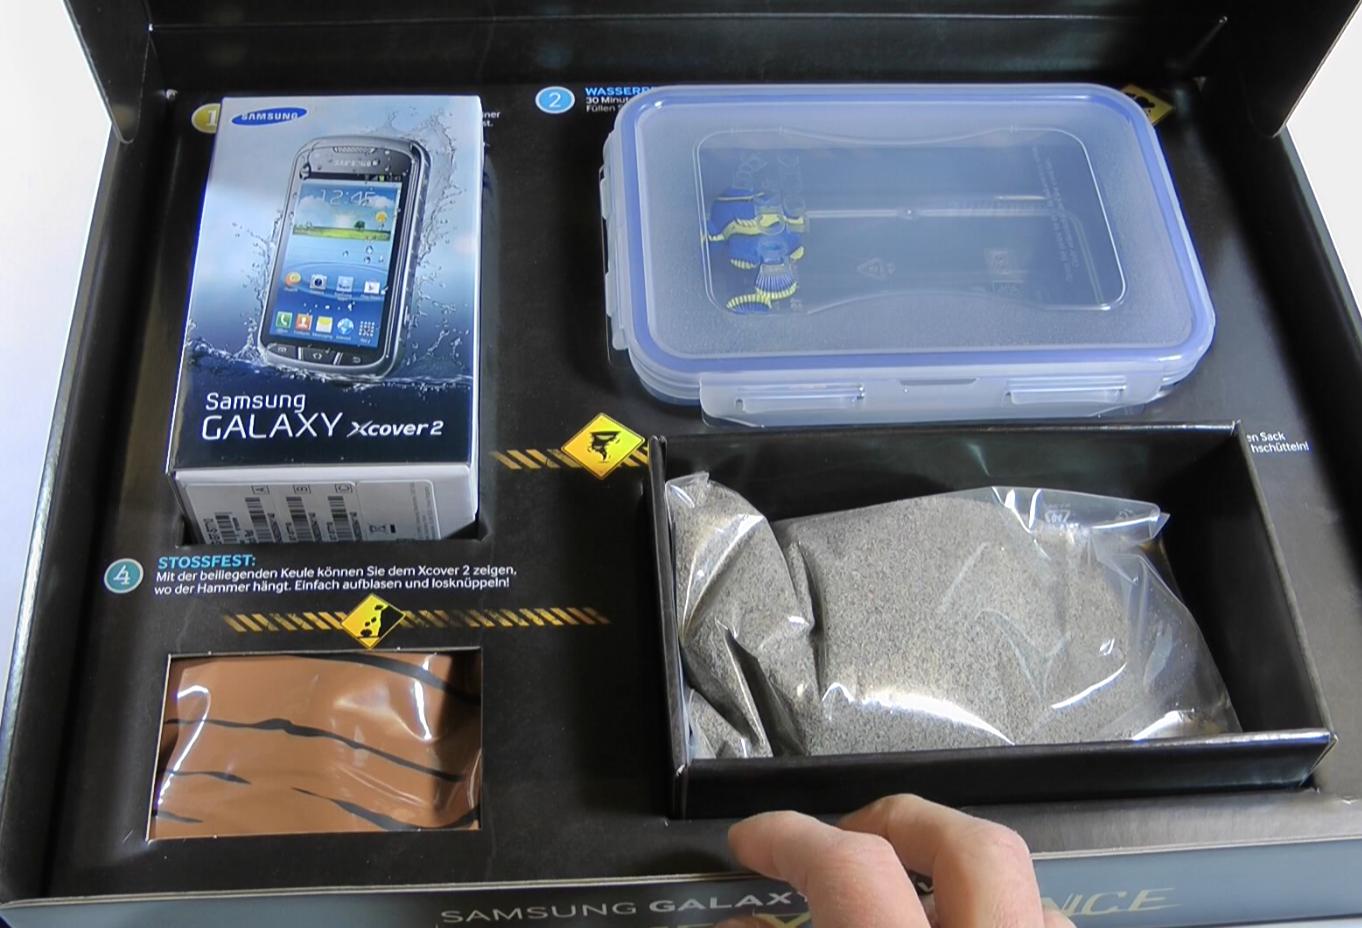 Xcover 2 – Samsungs neuer Outdoor-Androide im Unboxing und Tauchtest